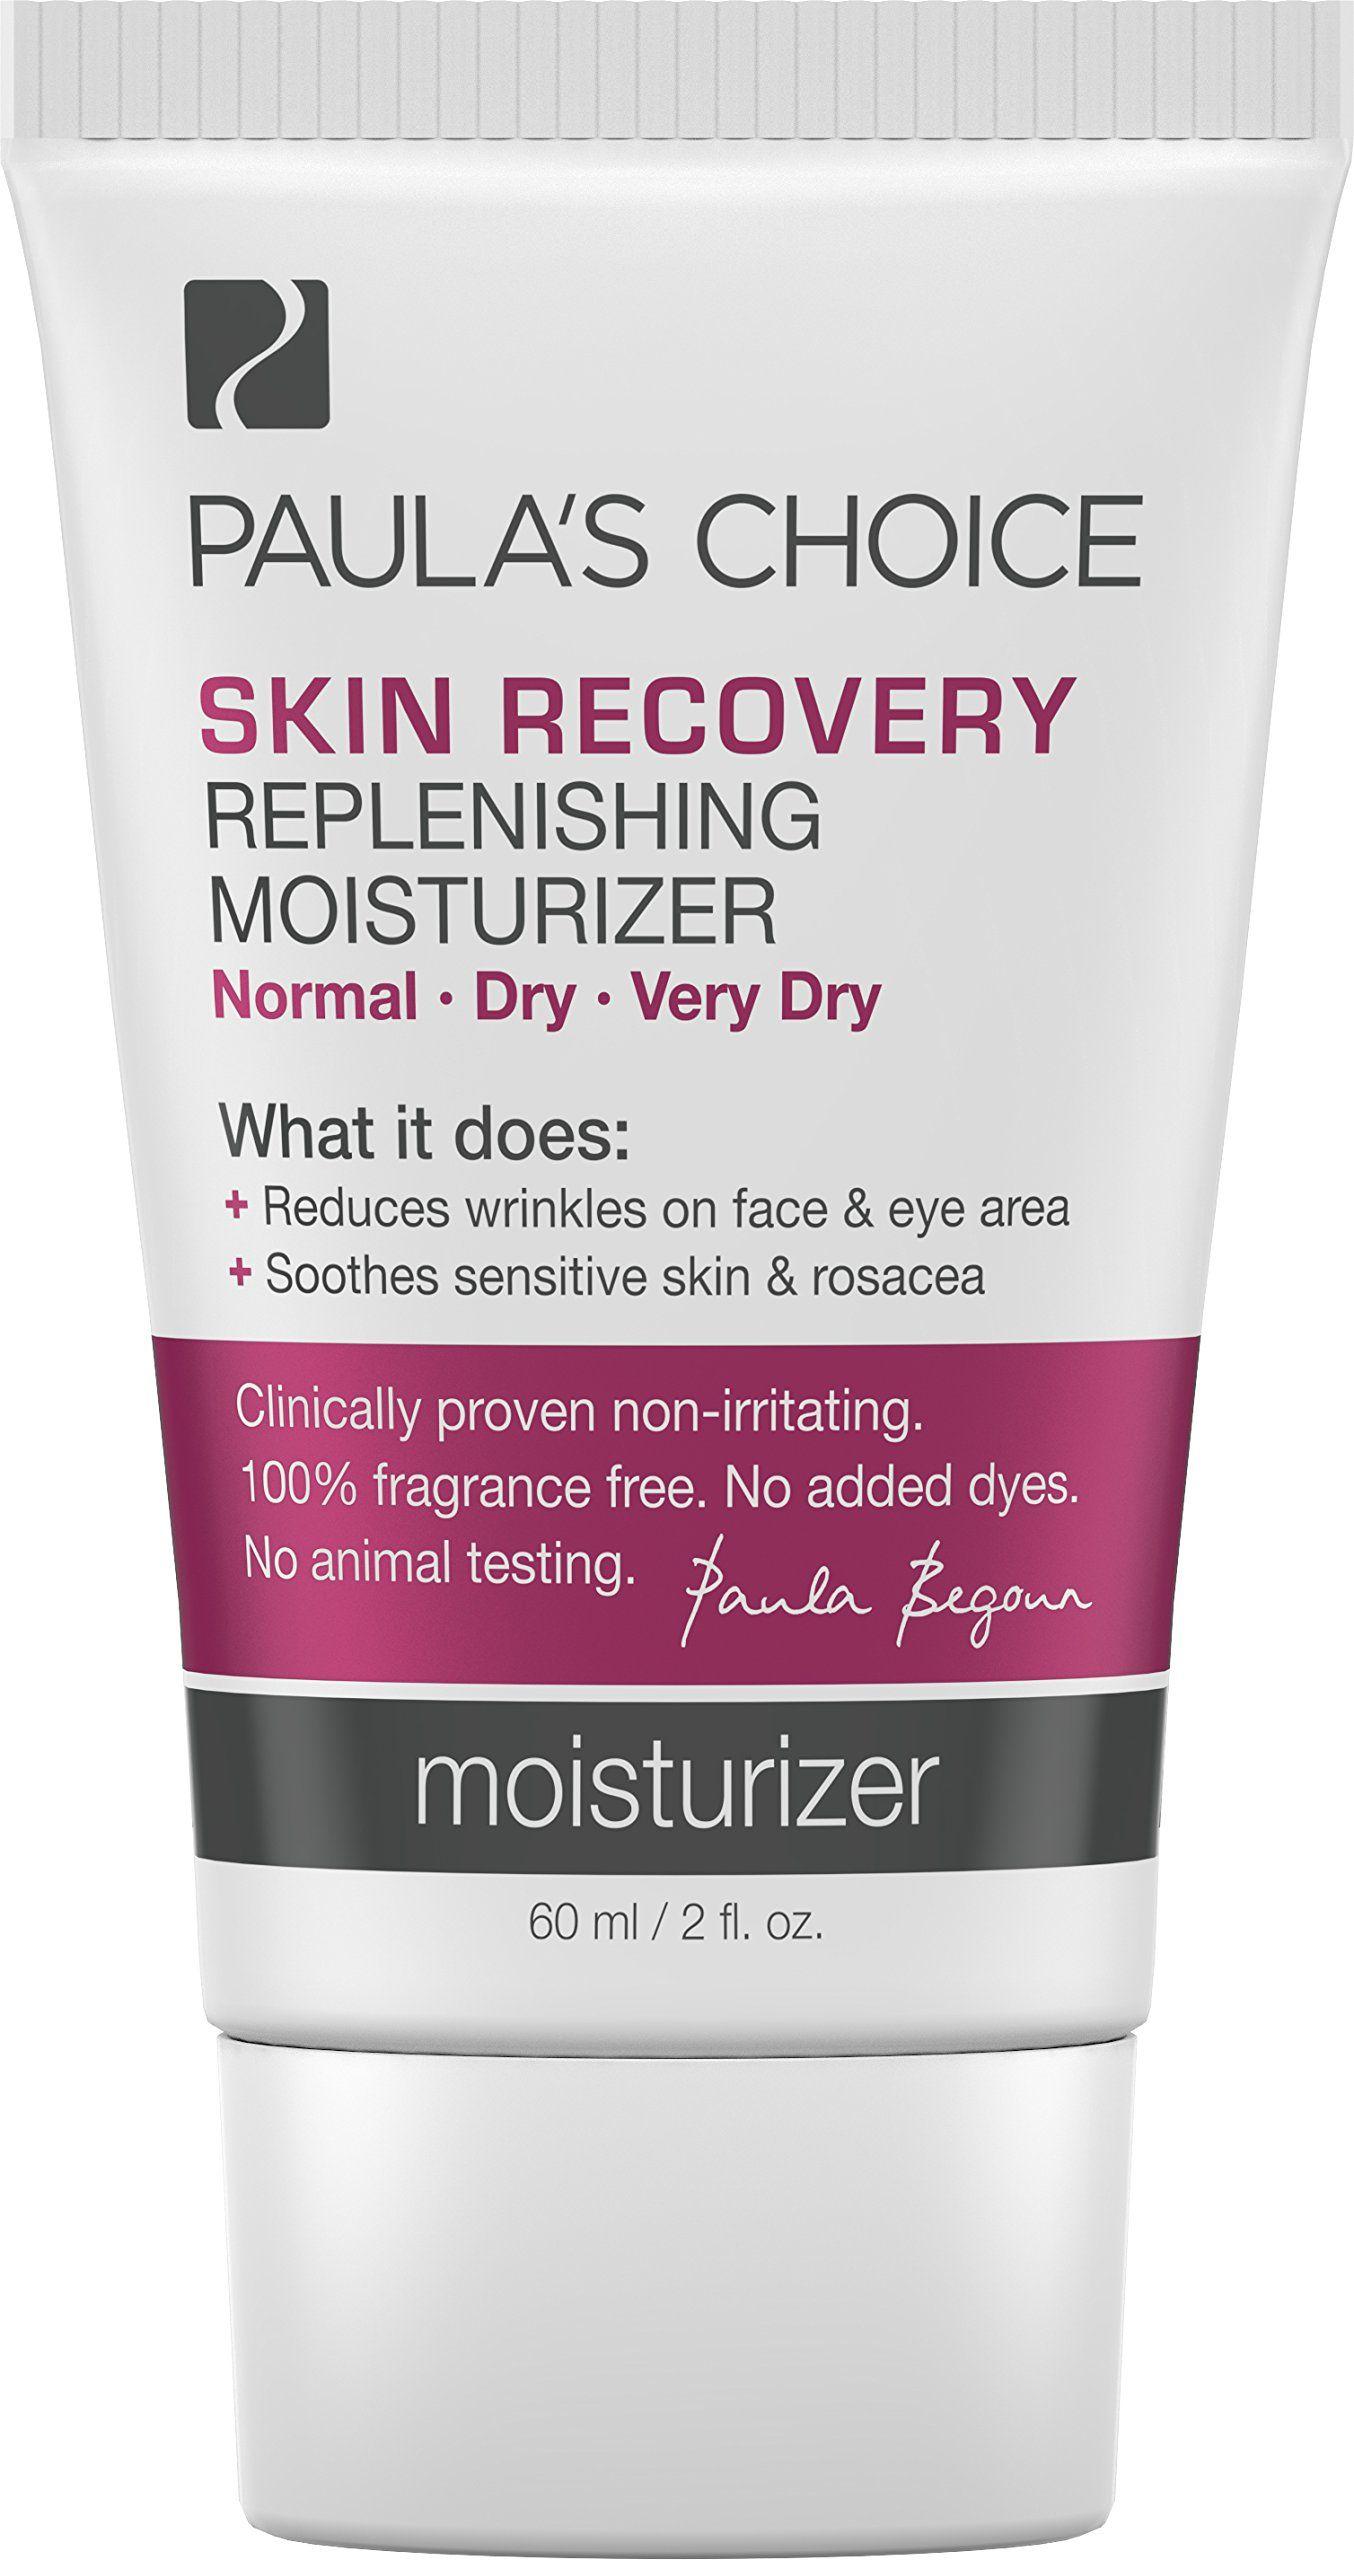 RESIST Skin Restoring Moisturizer with SPF 50 | Paula's Choice